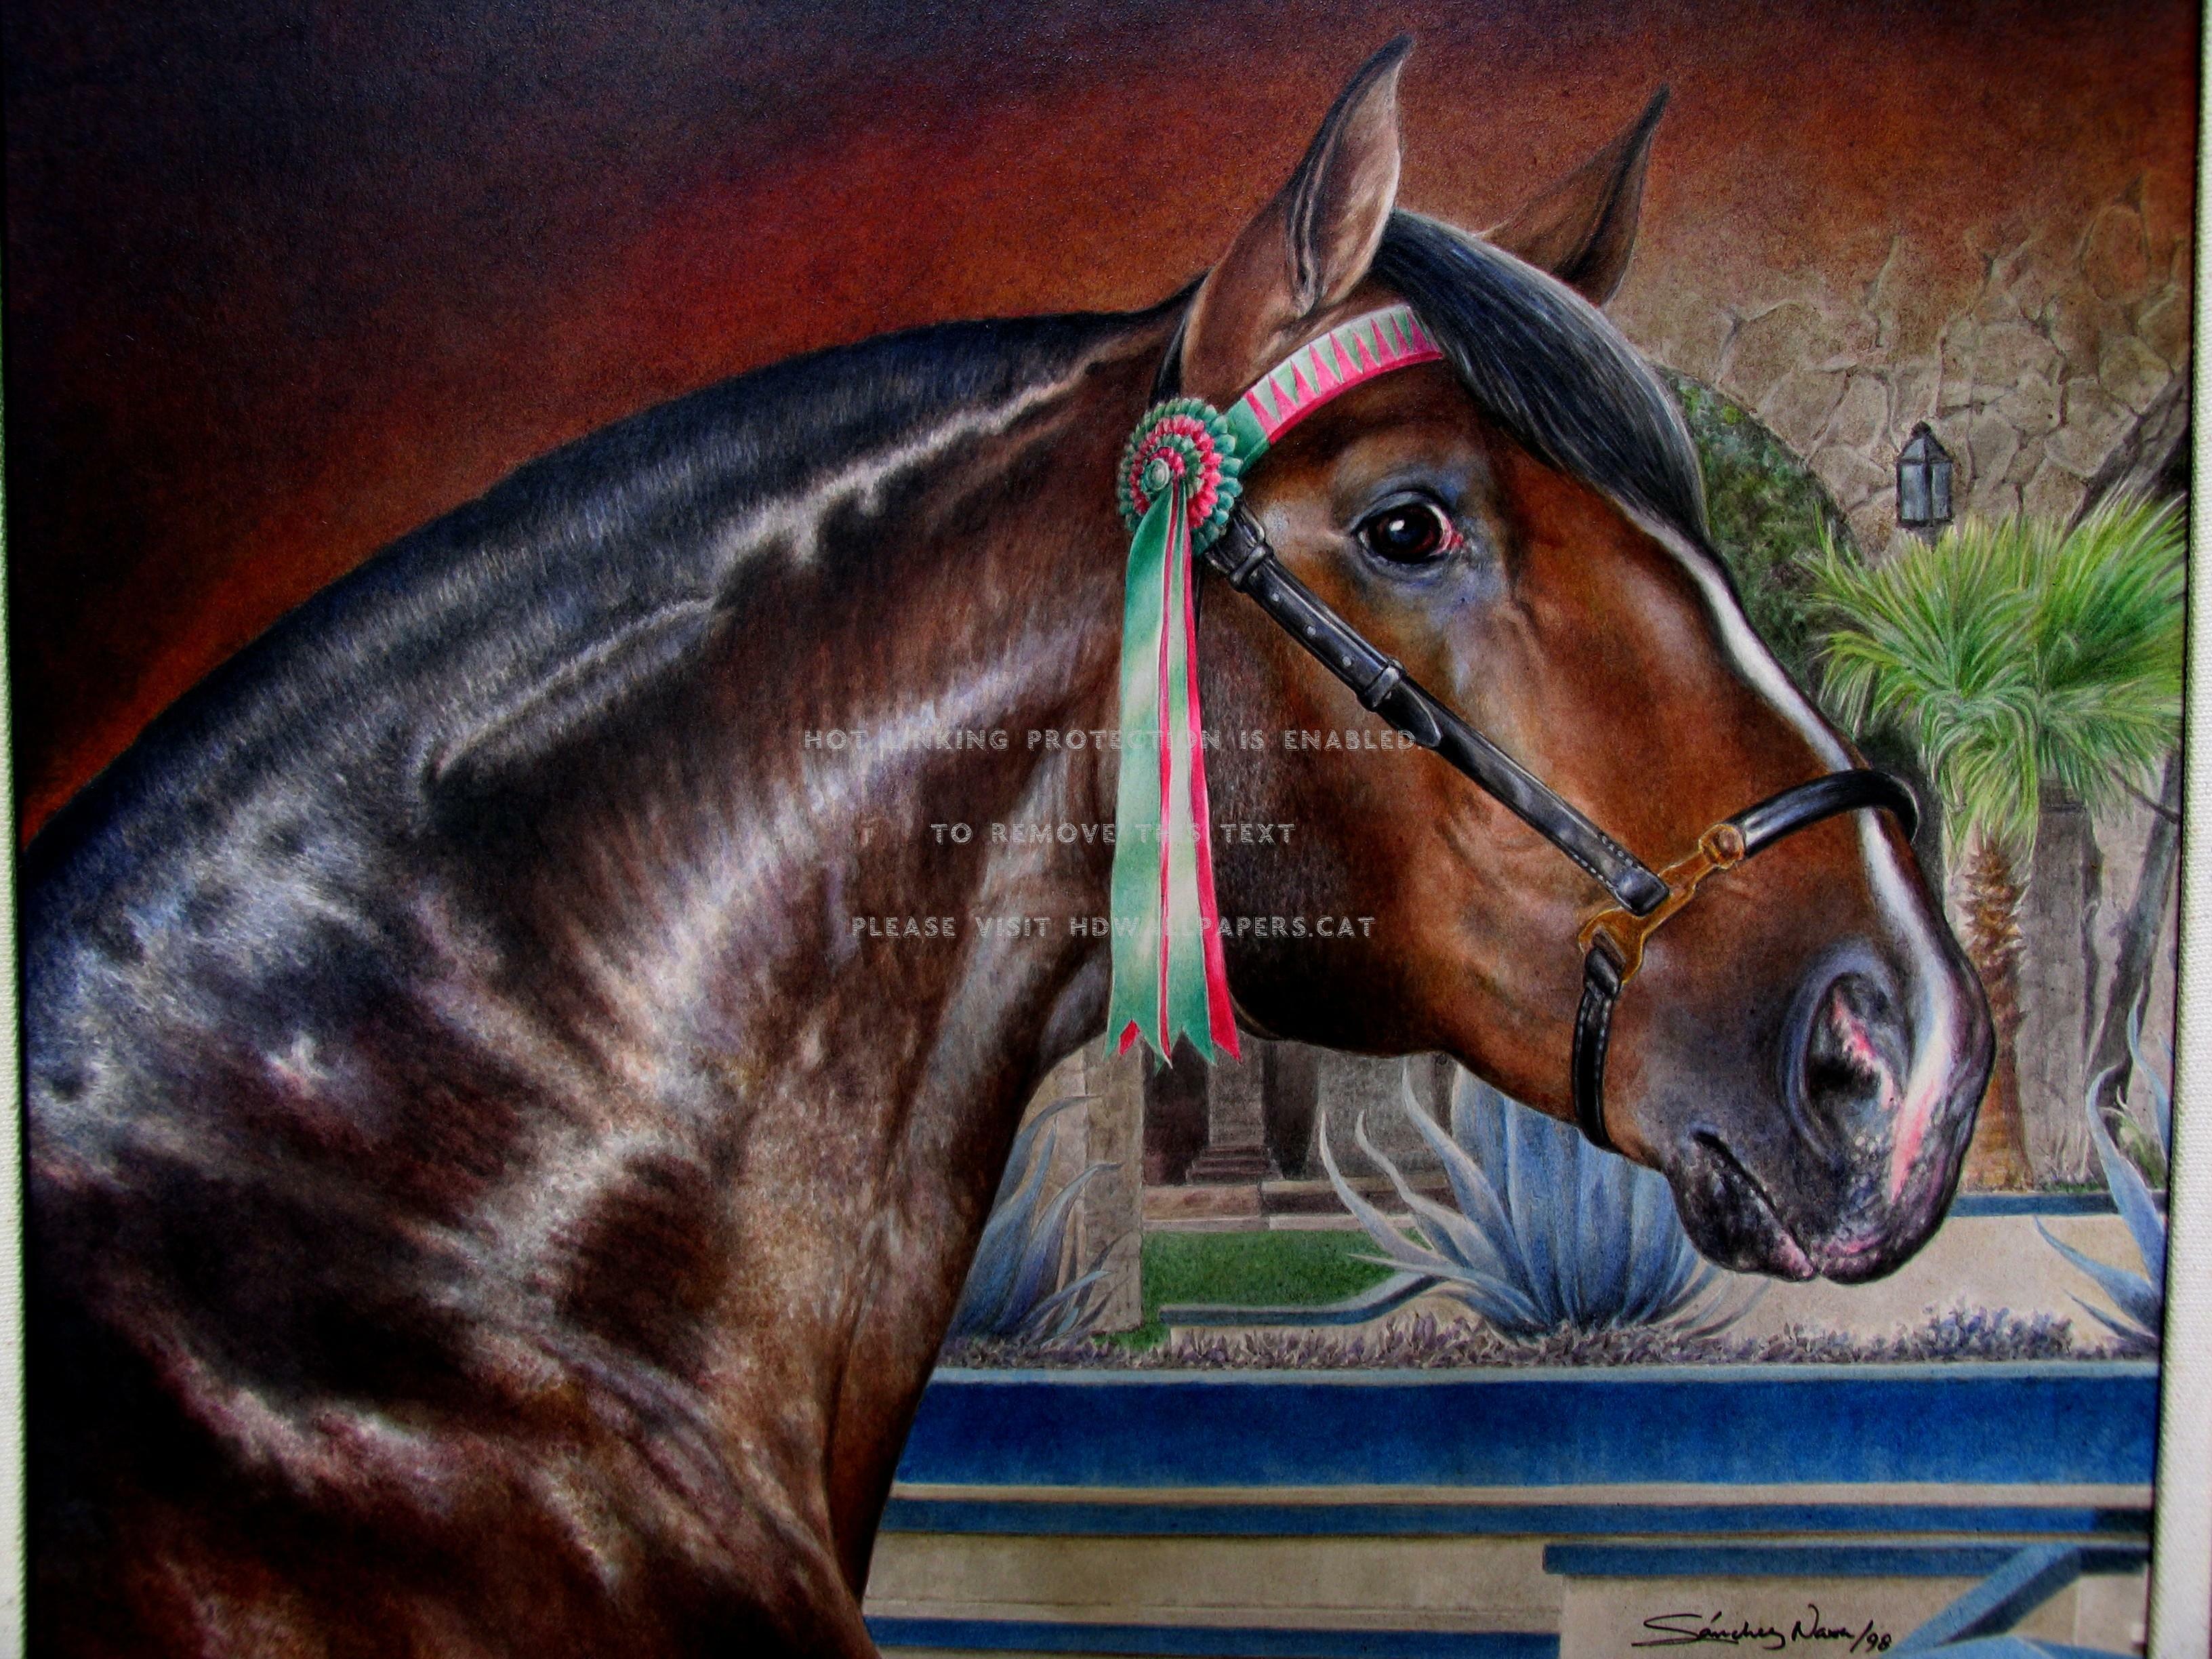 Xperto Dos Cavaleiros 1379925 Hd Wallpaper Backgrounds Download